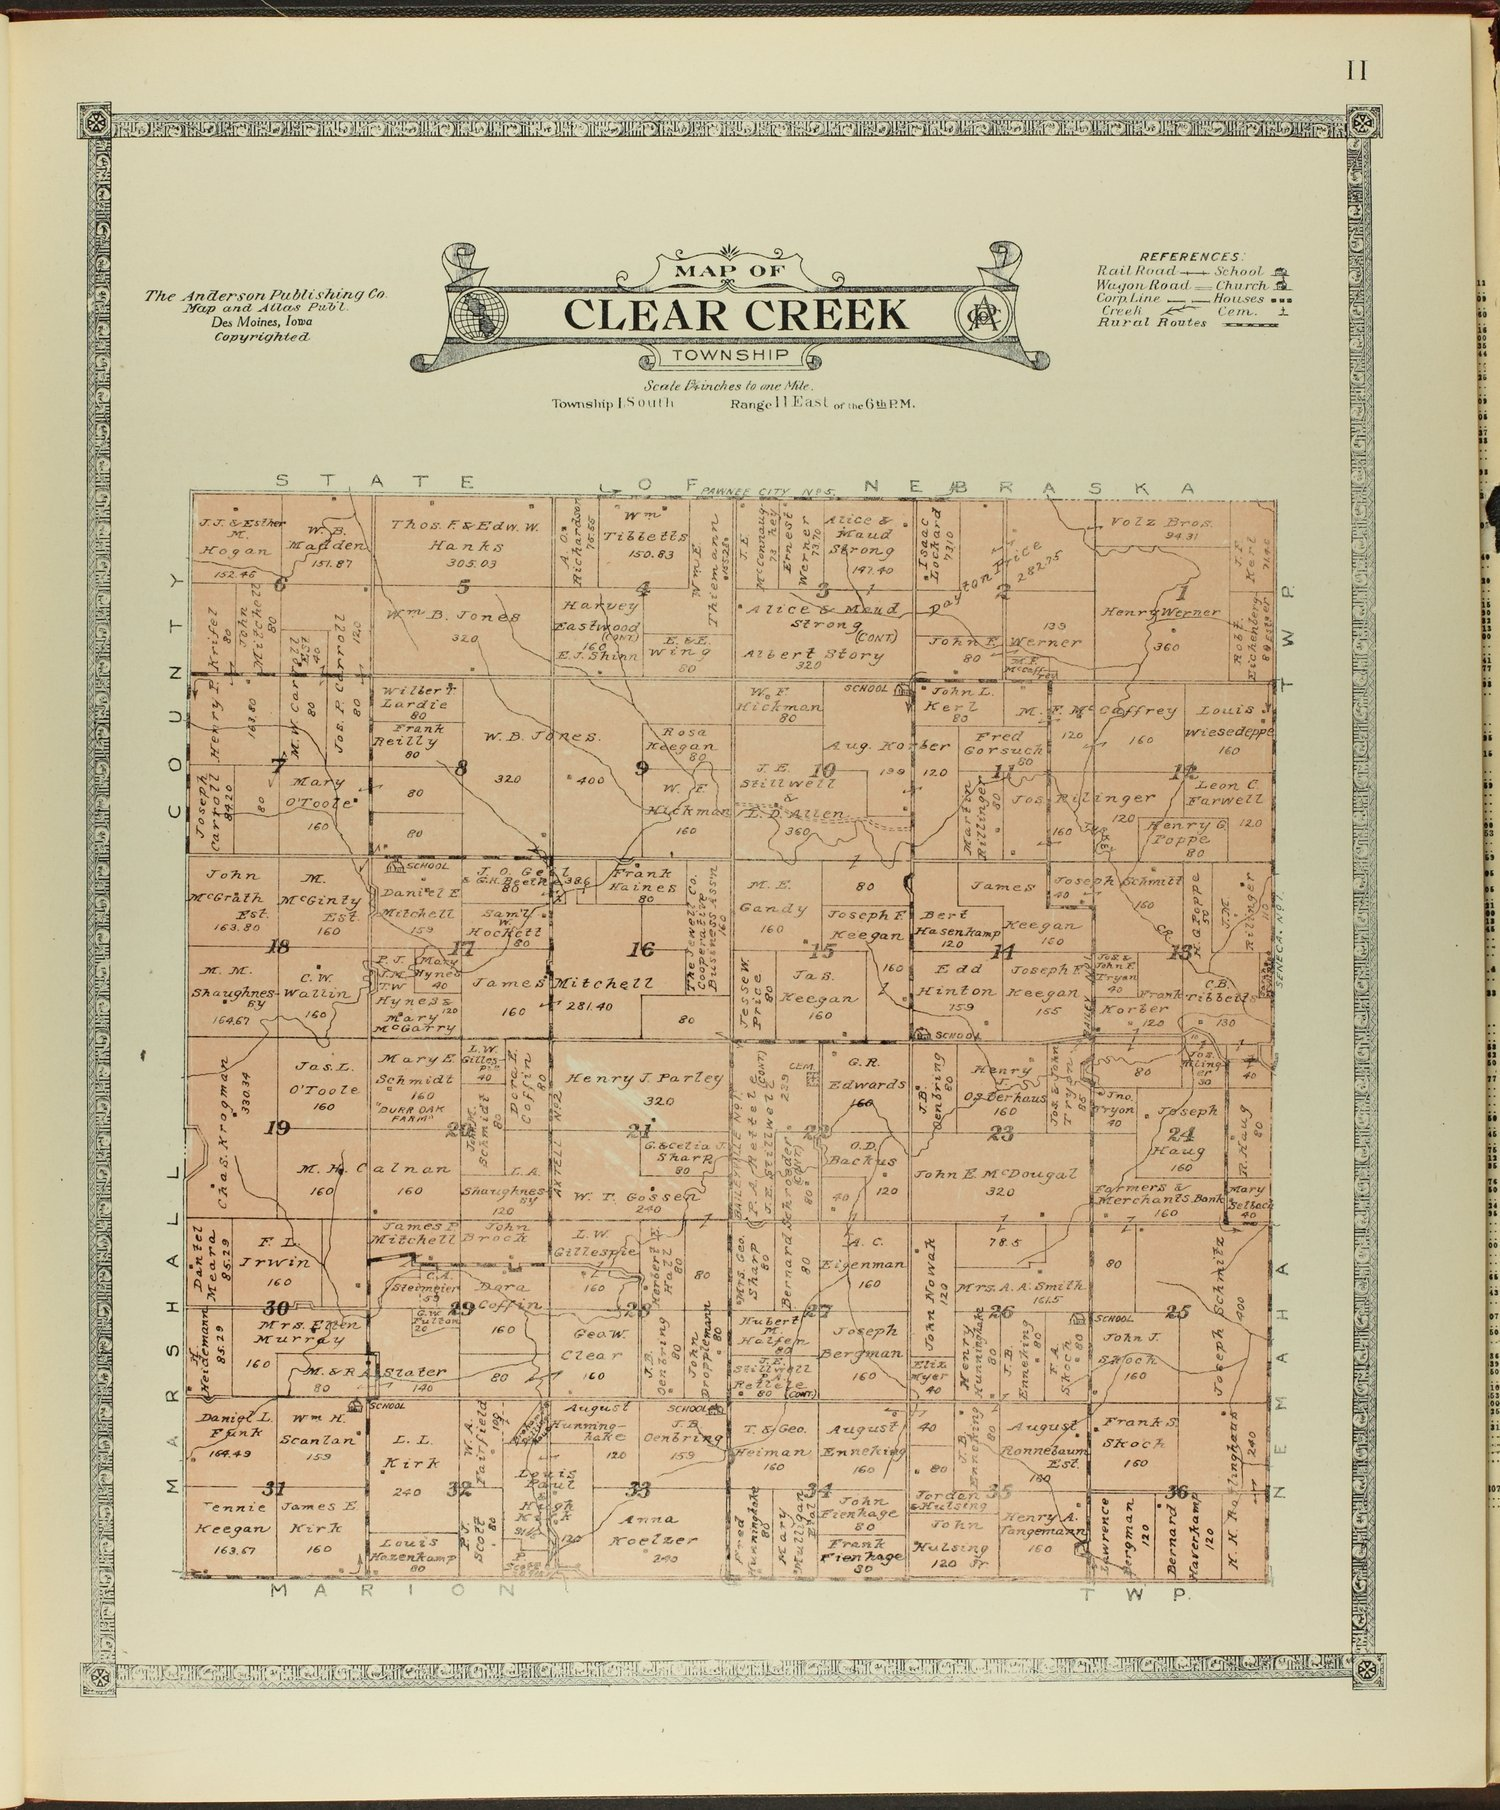 Atlas of Nemaha County, Kansas - 11